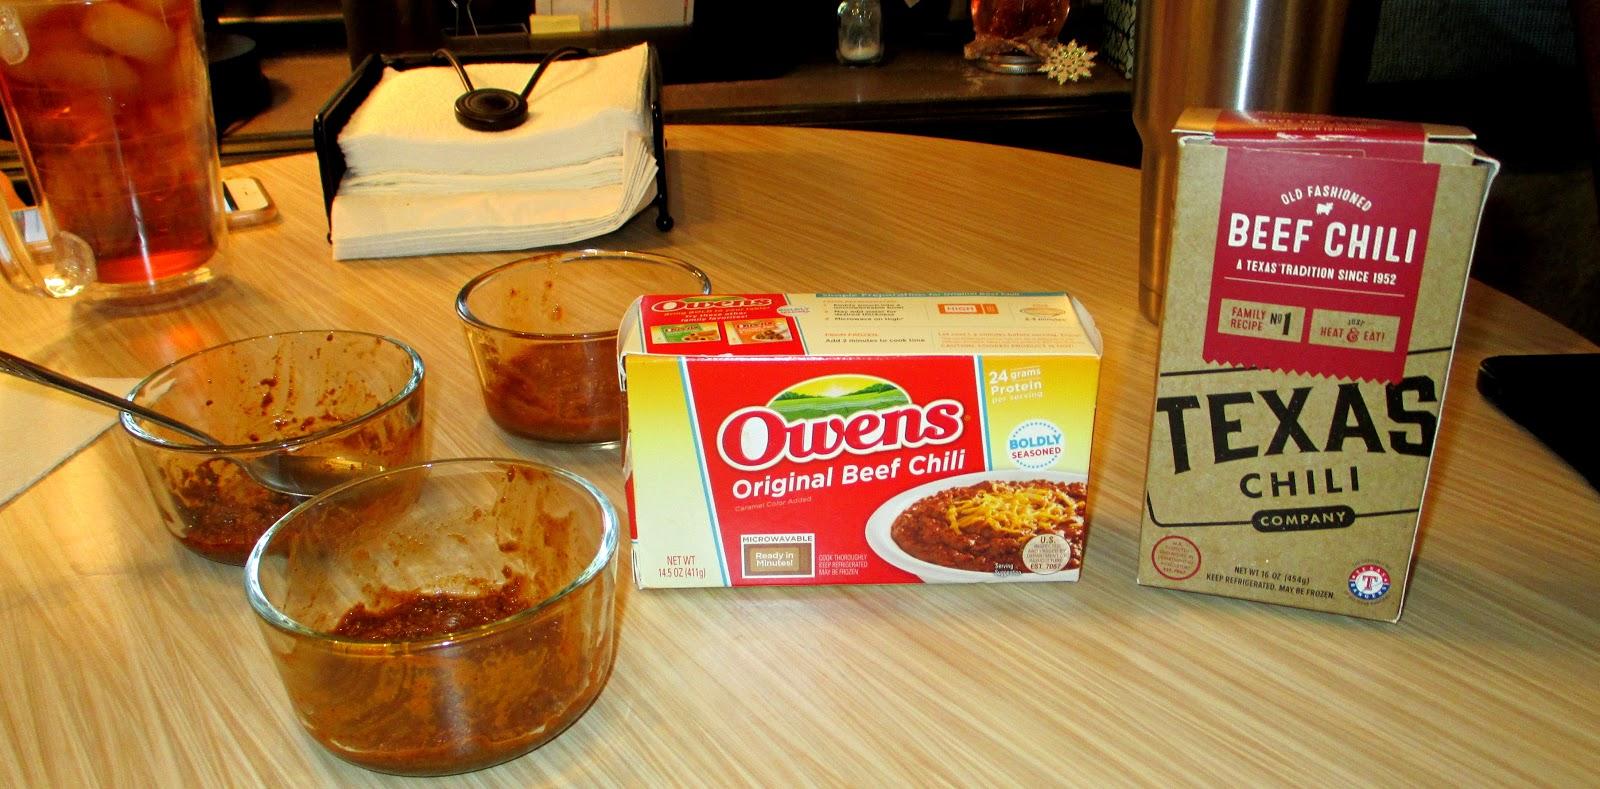 how to make wolf brand chili taste better